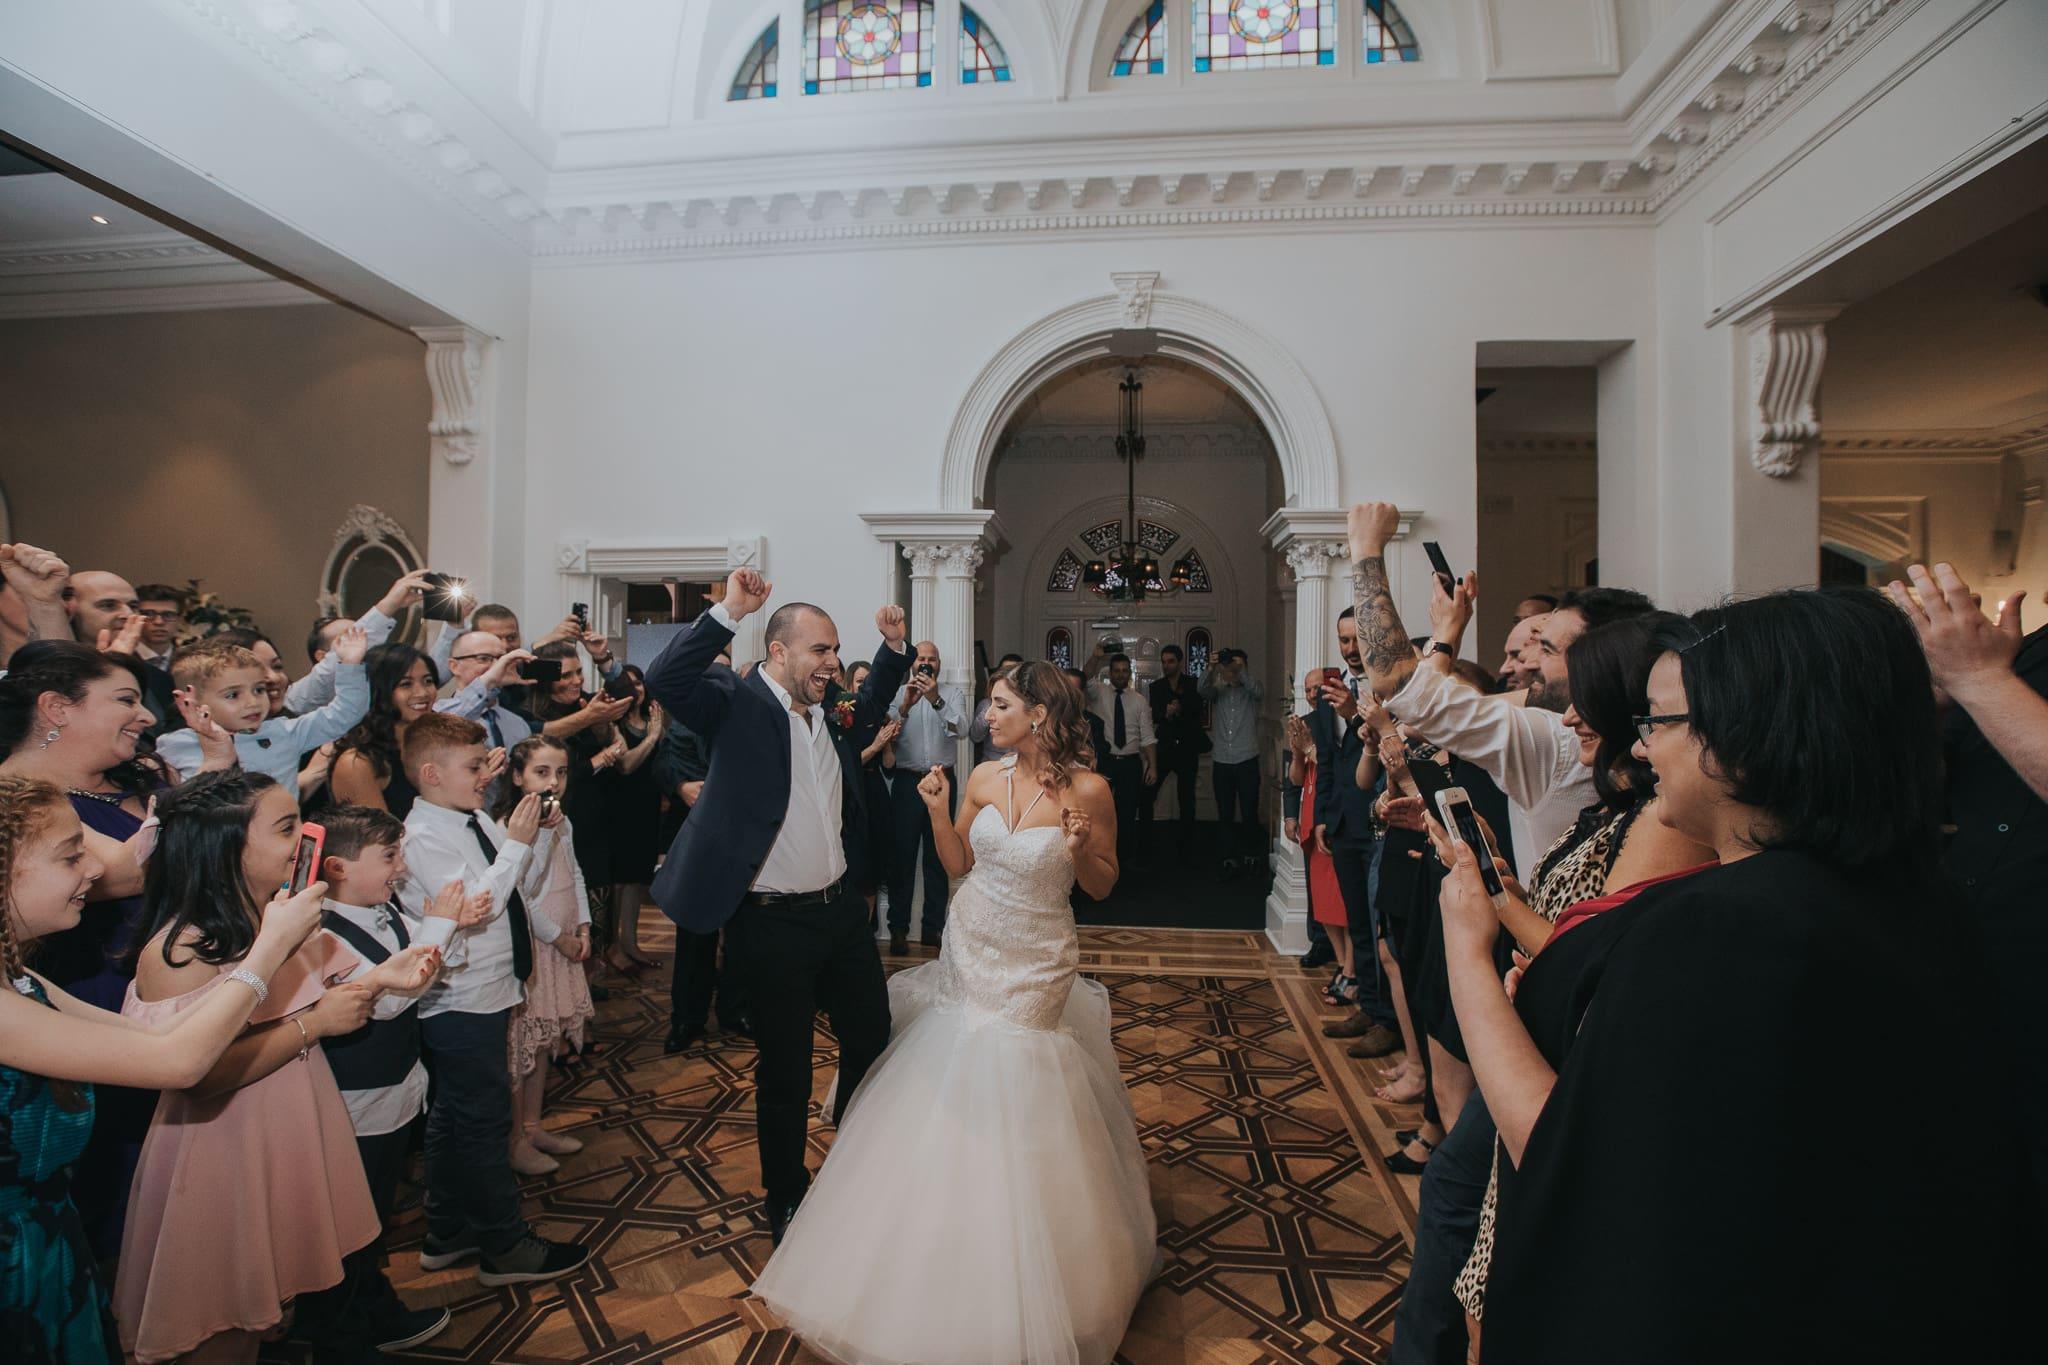 First Dance at Quat Quatta - Wedding Photographer in Melbourne